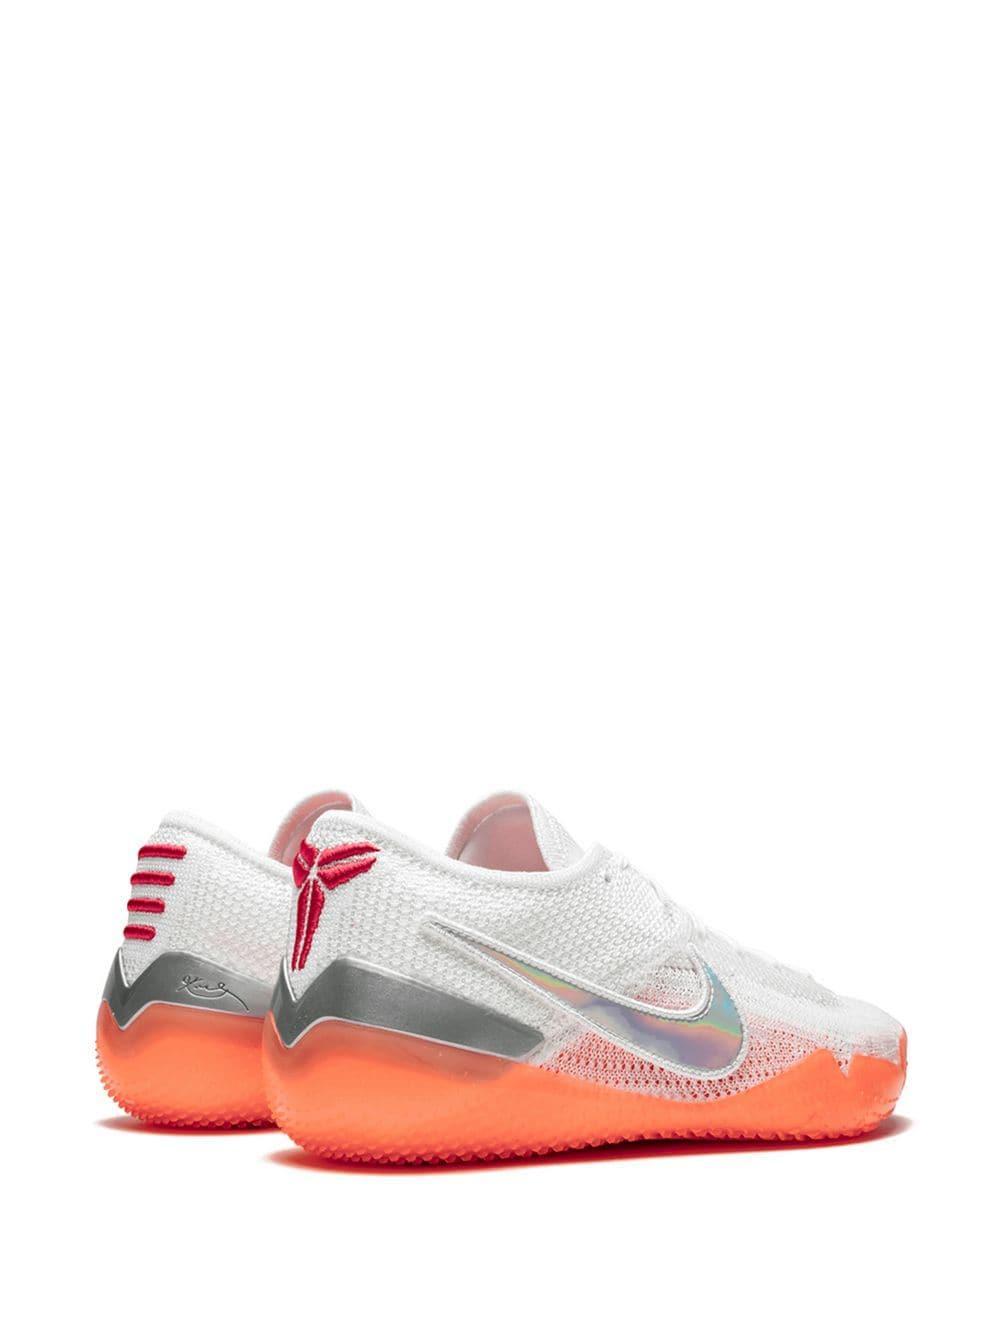 new arrival 563c9 bb687 Nike - White Kobe Ad Nxt 360 Sneakers for Men - Lyst. View fullscreen